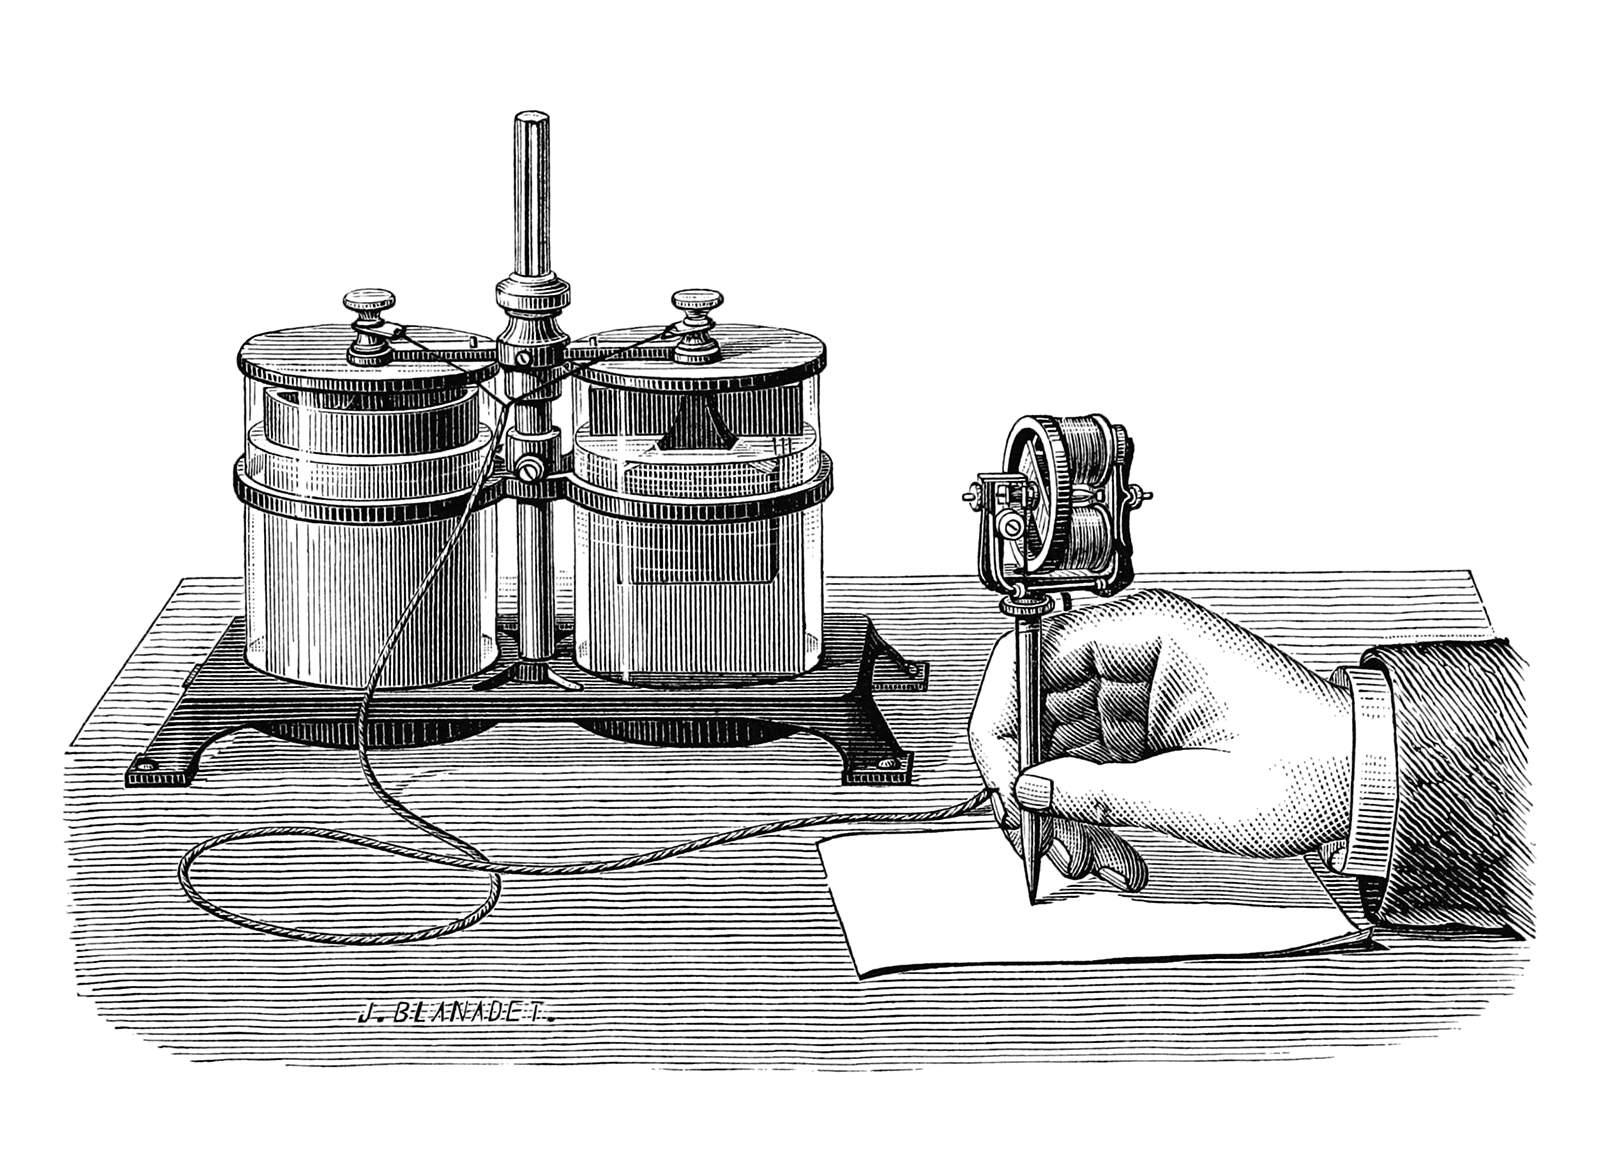 Edison's electric pen